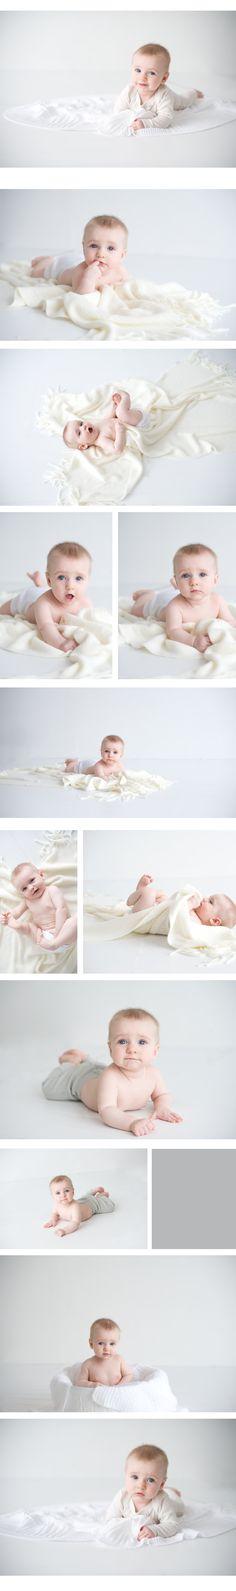 Baby boy 6 months    Lane Proffitt Photography |Nashville TN|